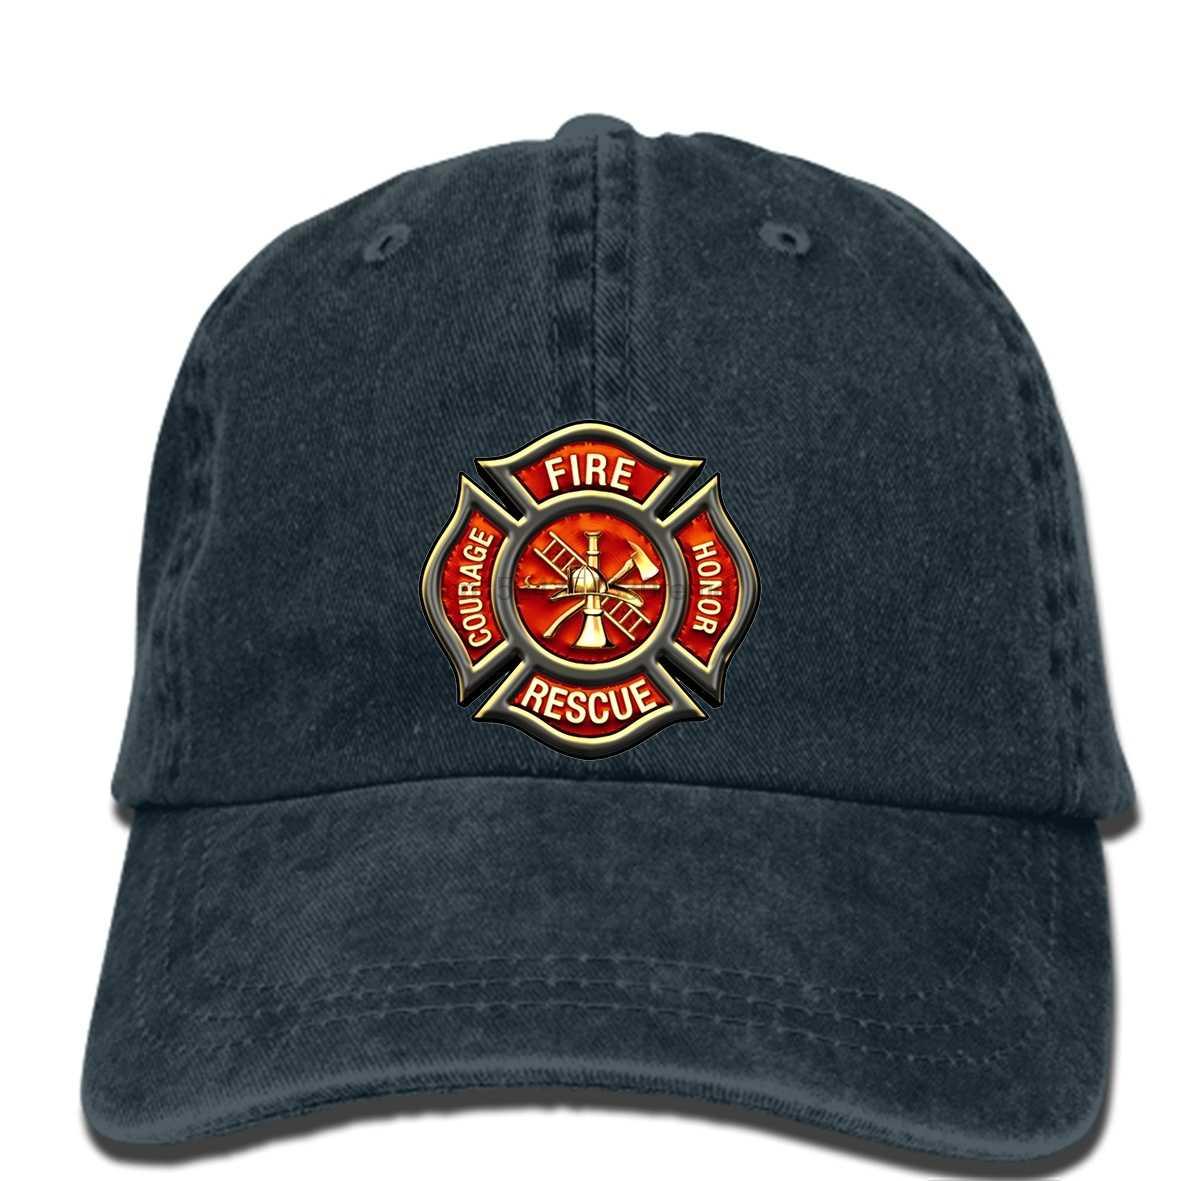 3a56b38a hip hop Baseball caps Classic Firefighter Fire Emblem Black Men's cap  Fashion